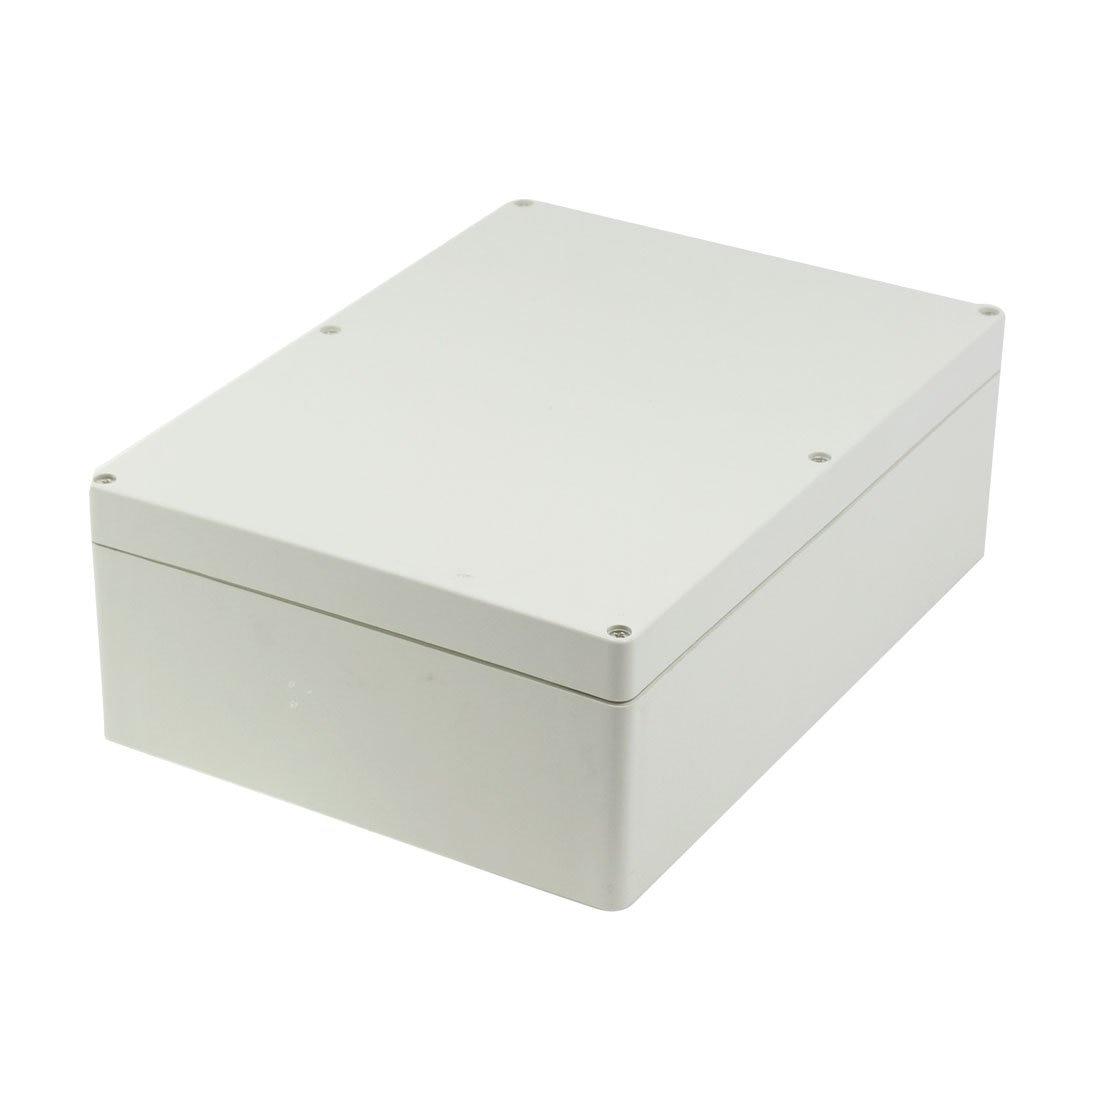 2 Pcs Of MOOL 290mm X 210mm X 100mm Waterproof Plastic Enclosure Case DIY Junction Box